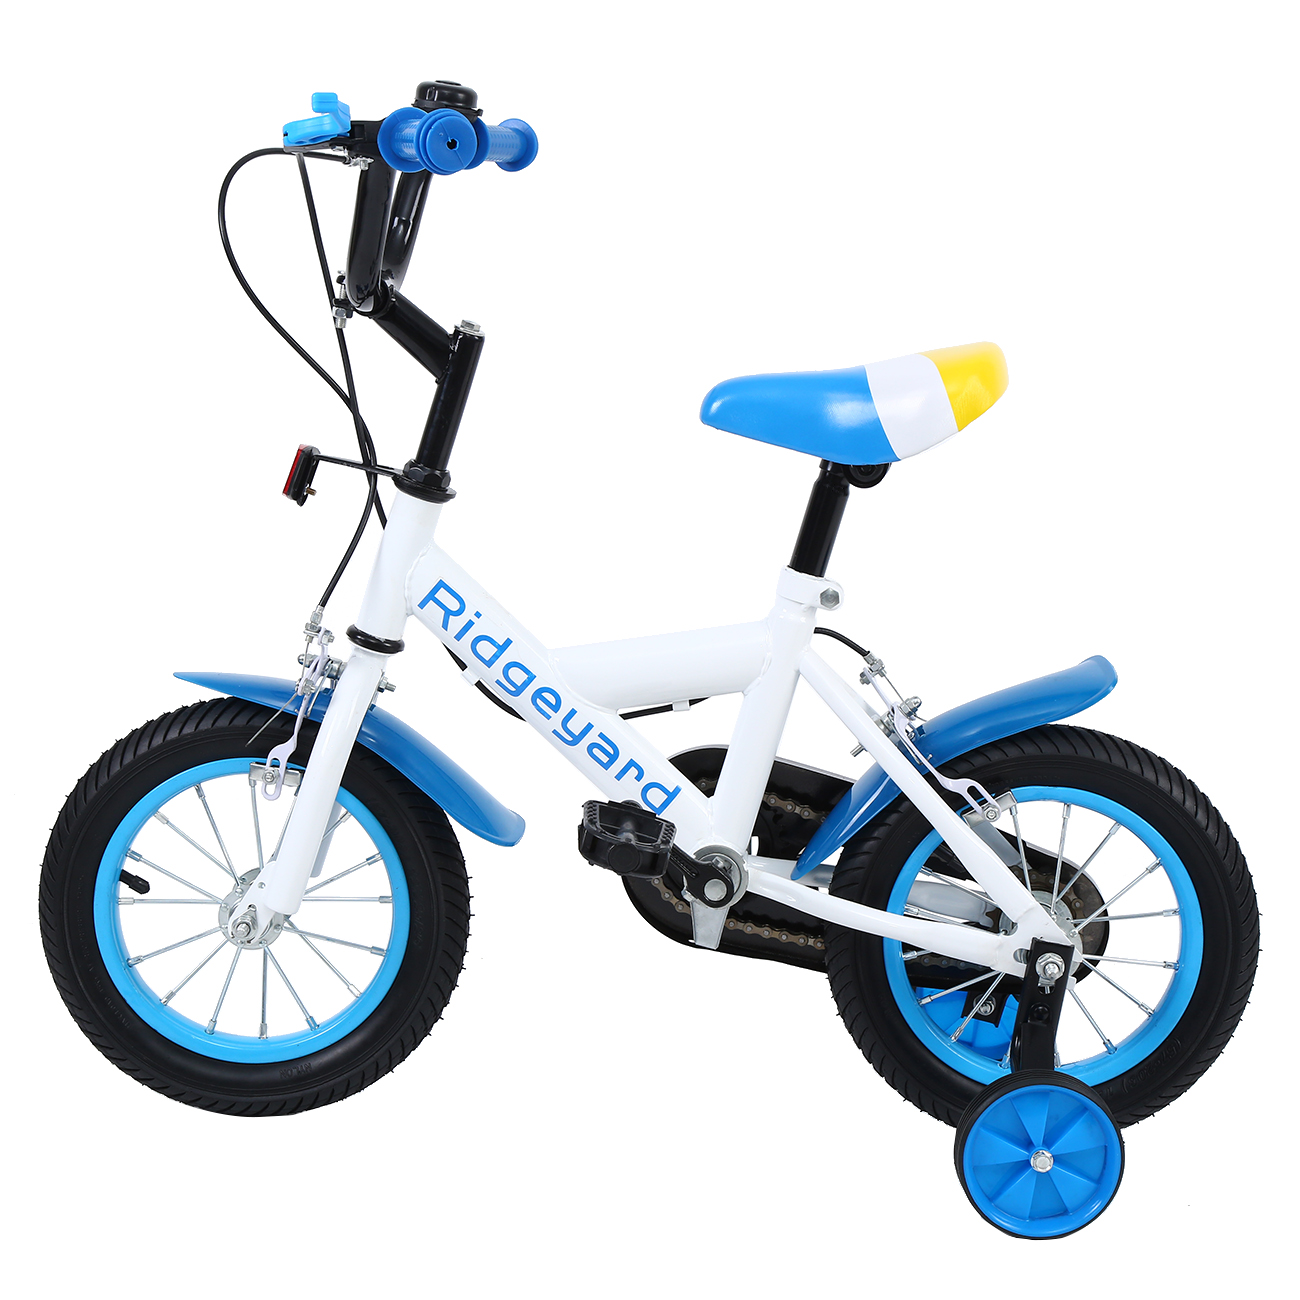 Yonntech  12 Inch Boys Girls Kids Bike Child Bicycle Age 1-5 Years W/ Training Wheel